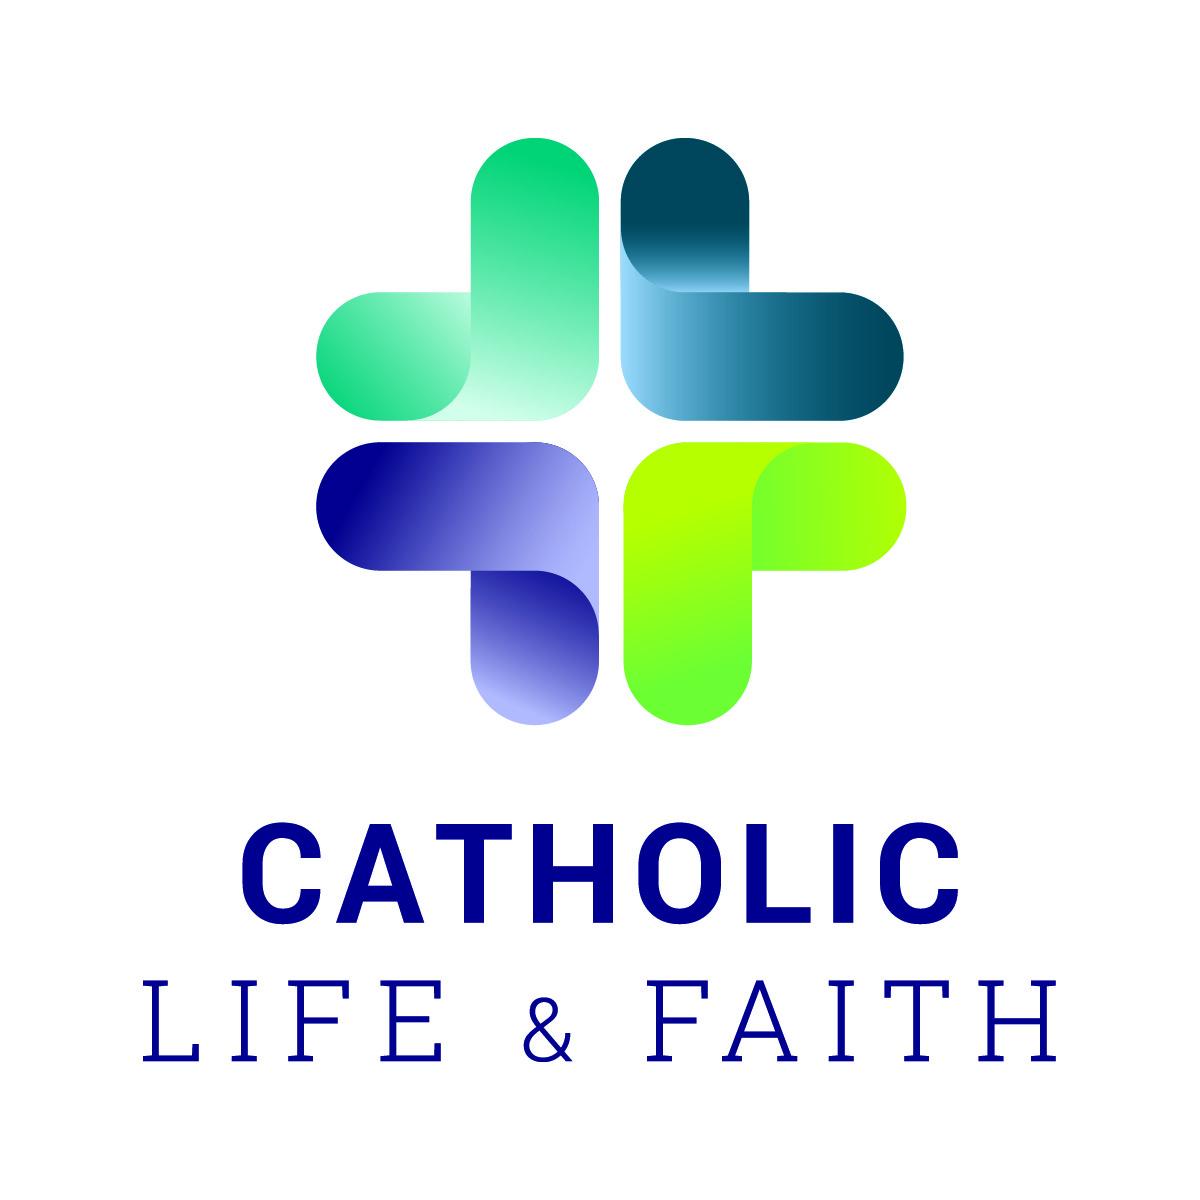 Catholic Life and Faith logo 4c-1.jpg